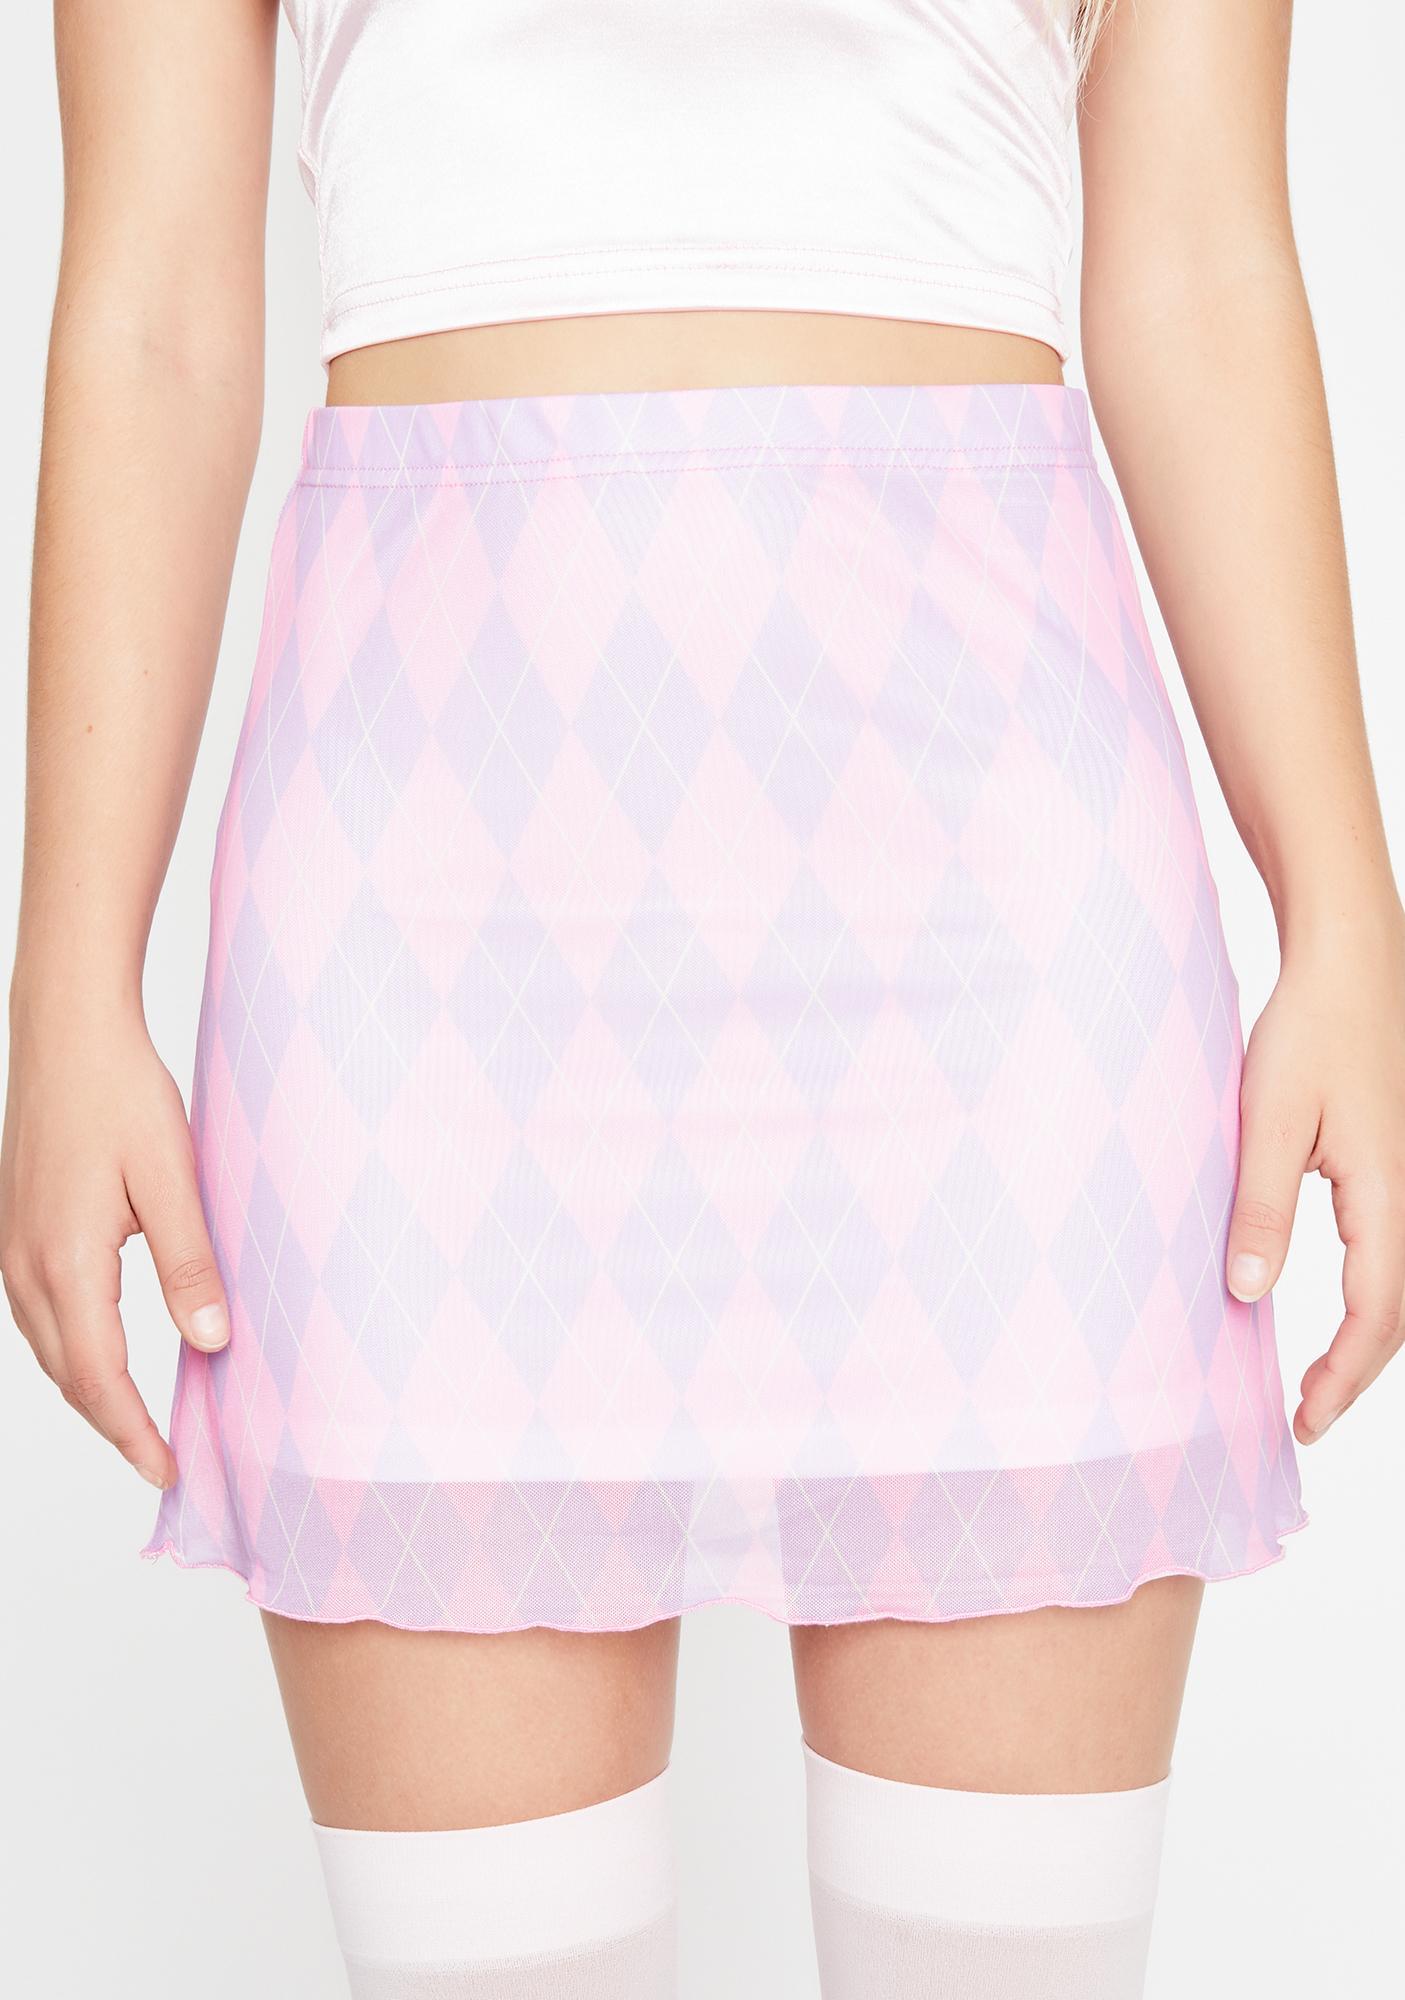 Sugar Thrillz Posse Protocol Mini Skirt